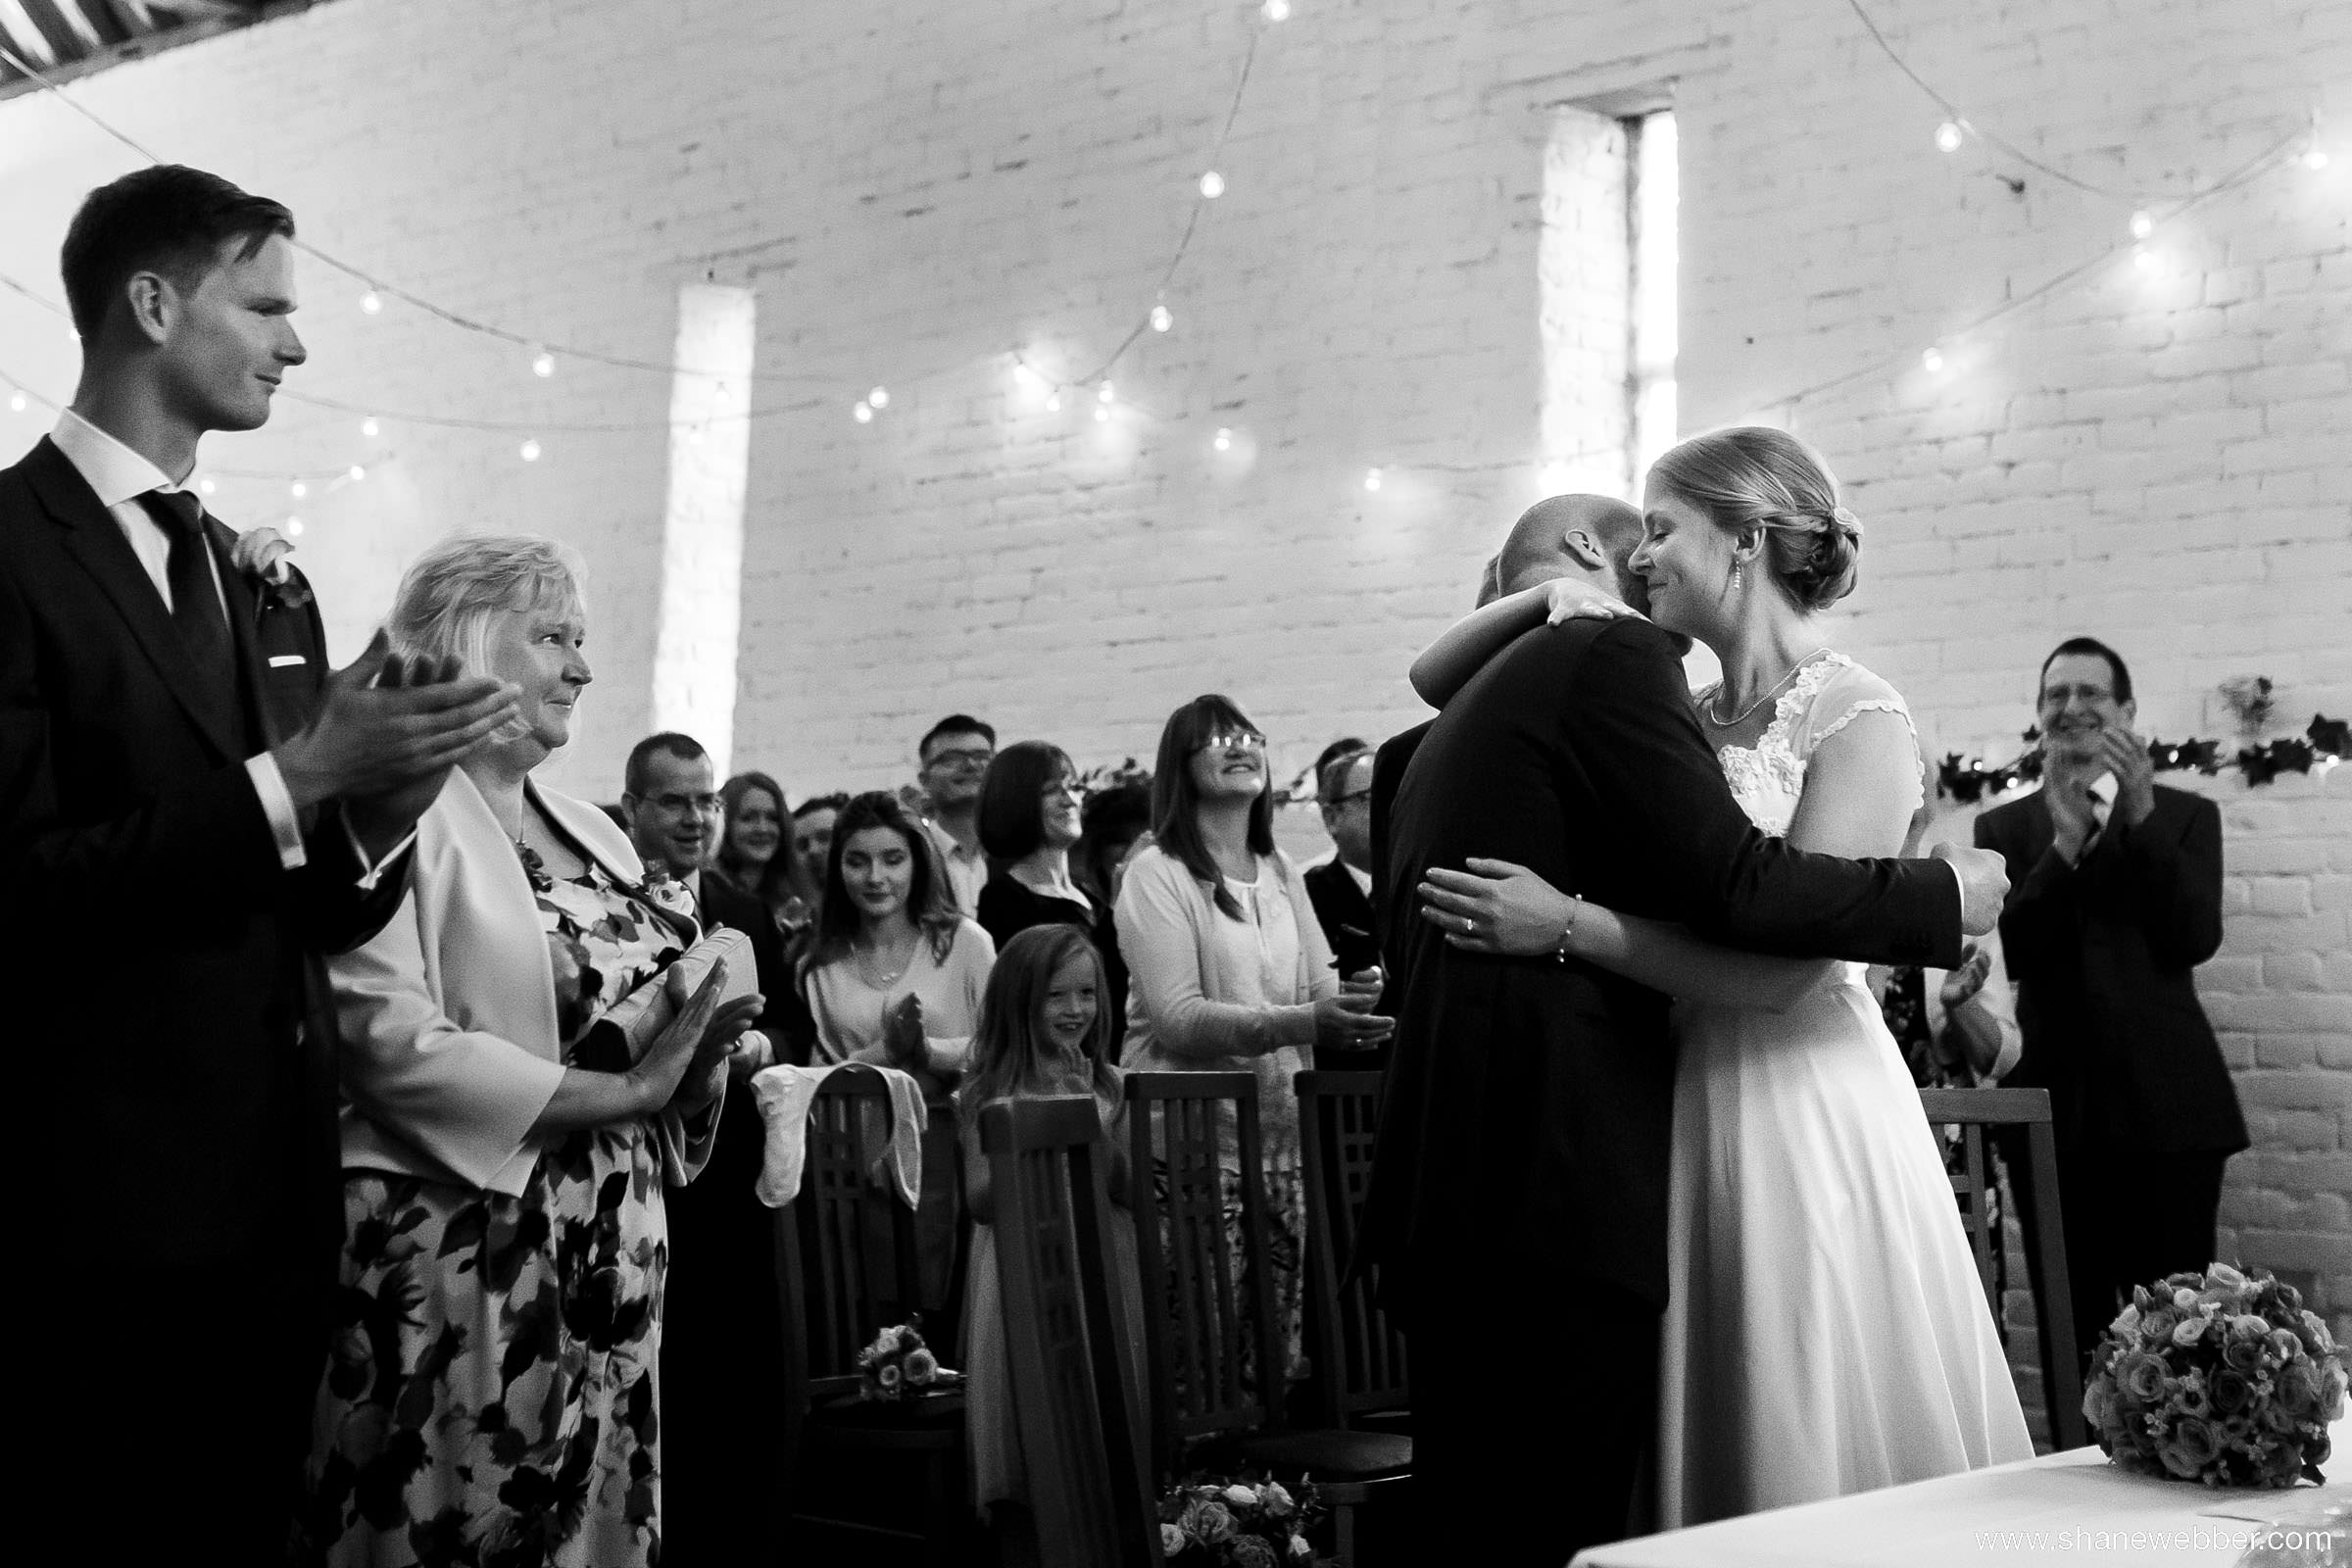 Best Barn Weddings Of 2016